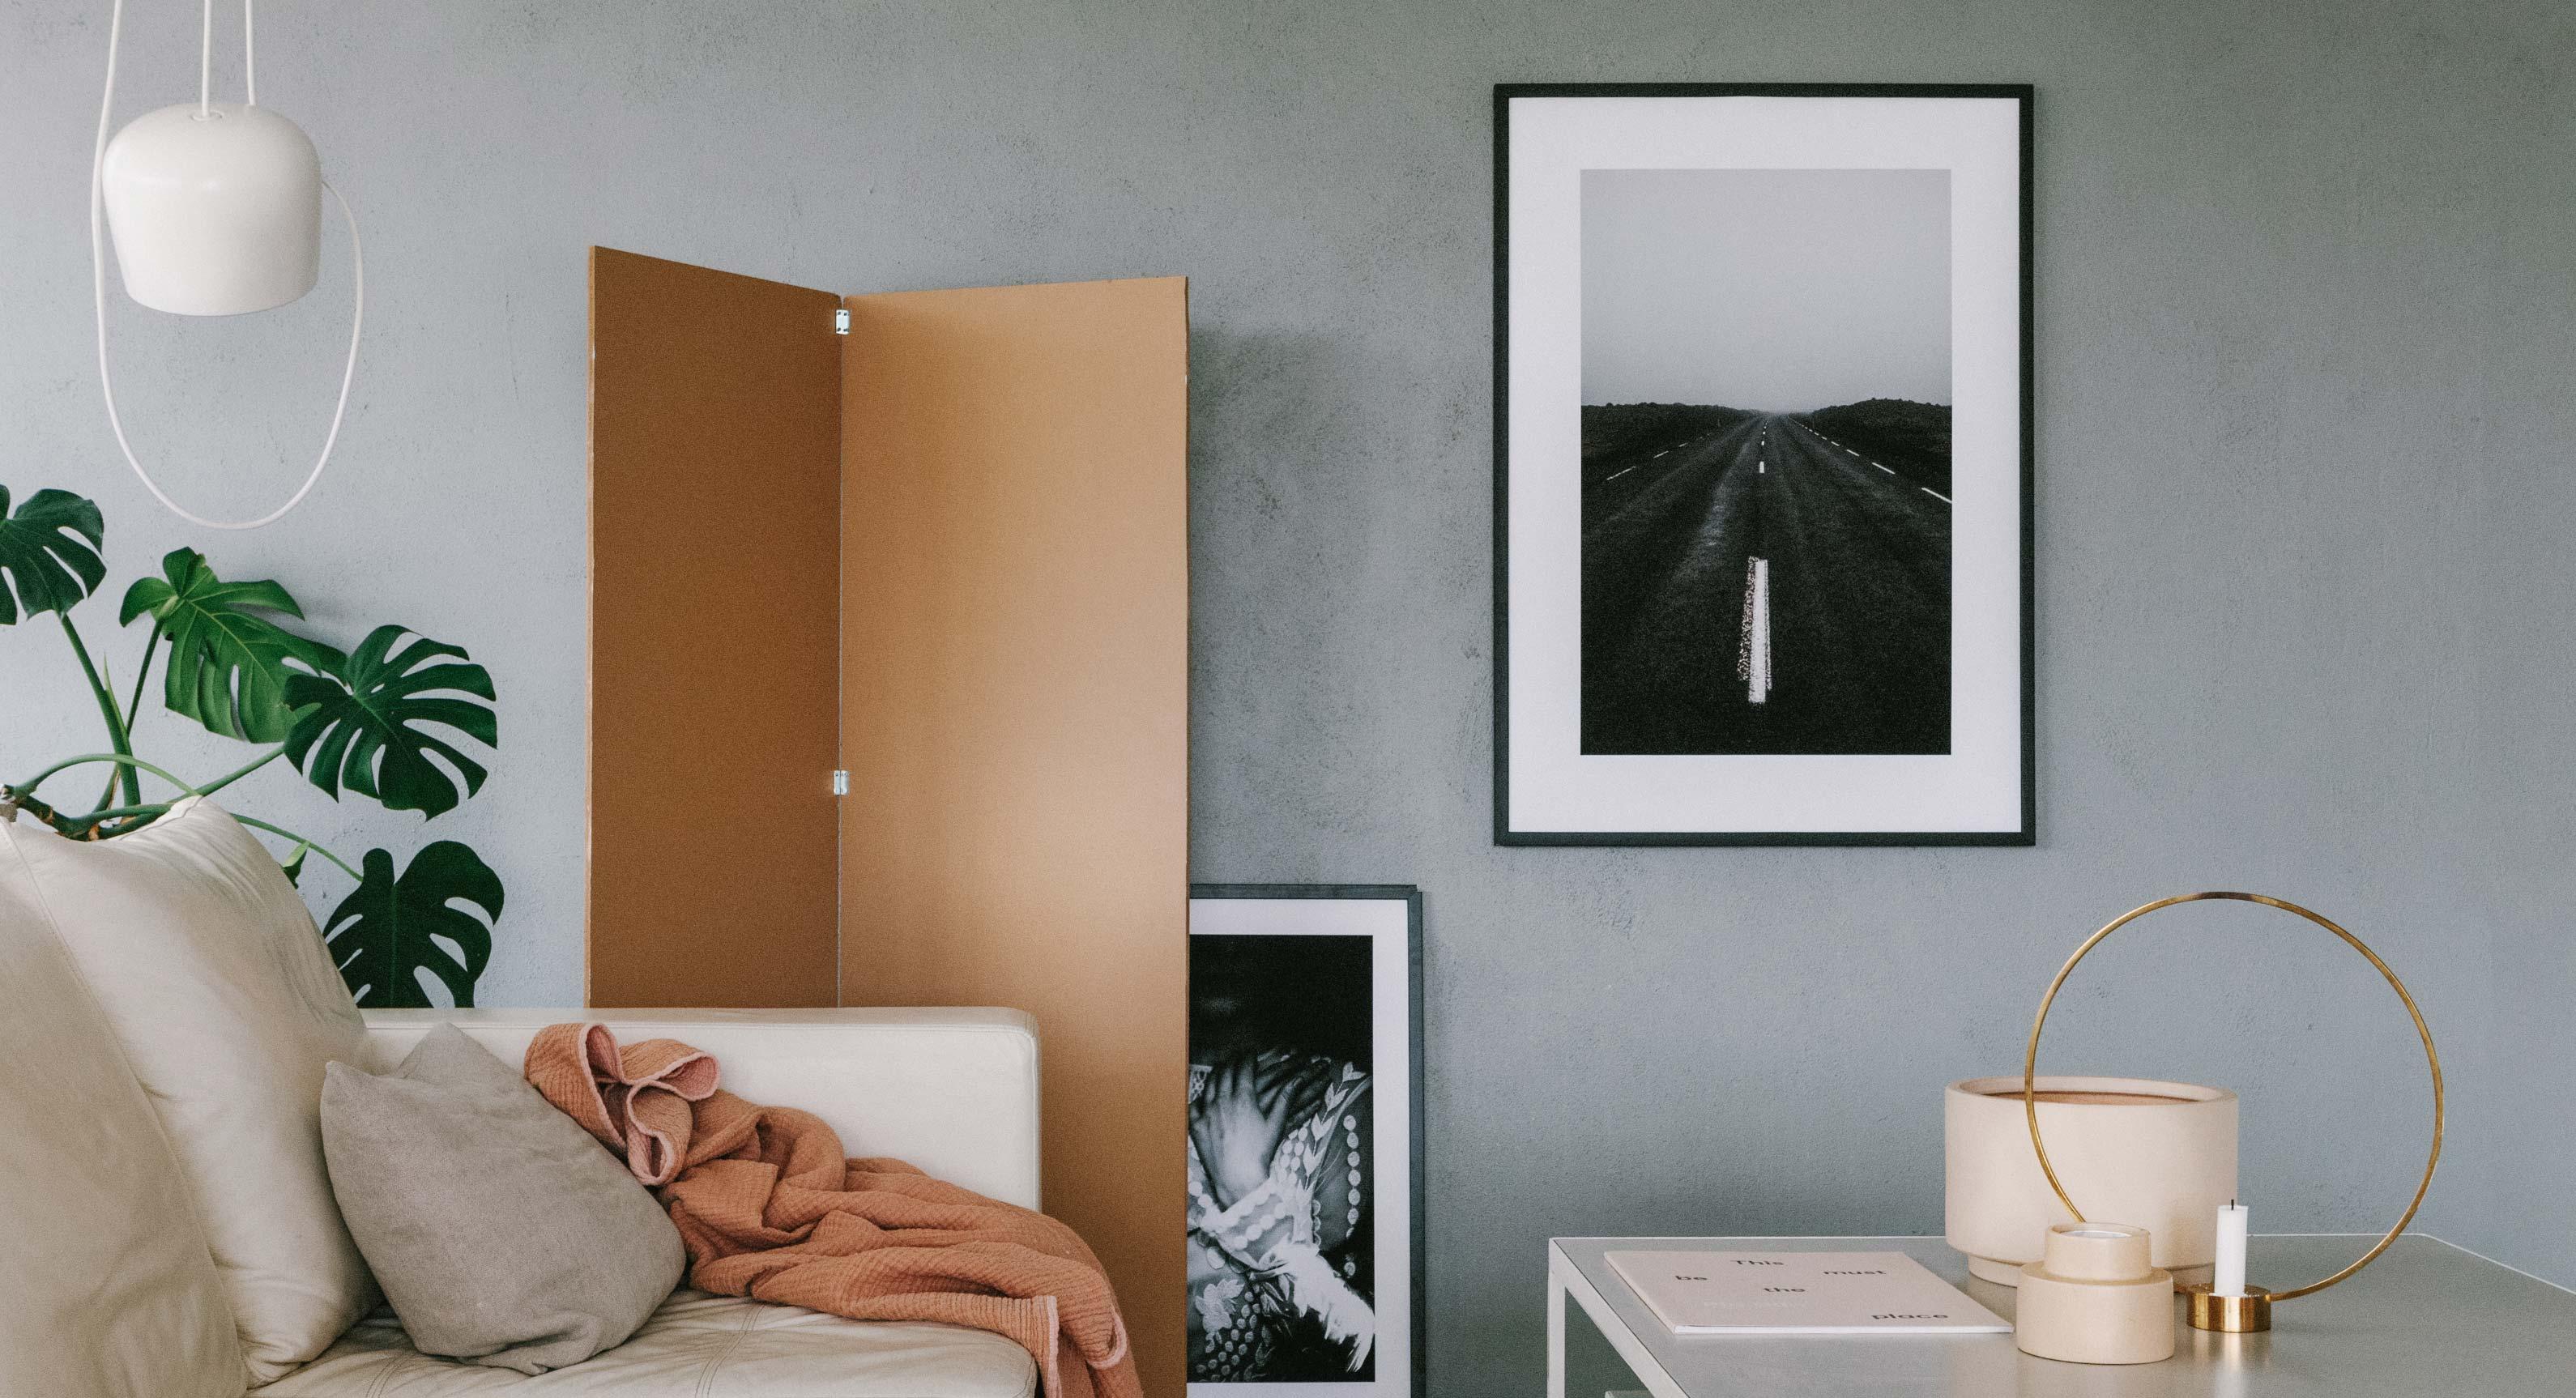 5 Art Prints To Transform Your Home Interior